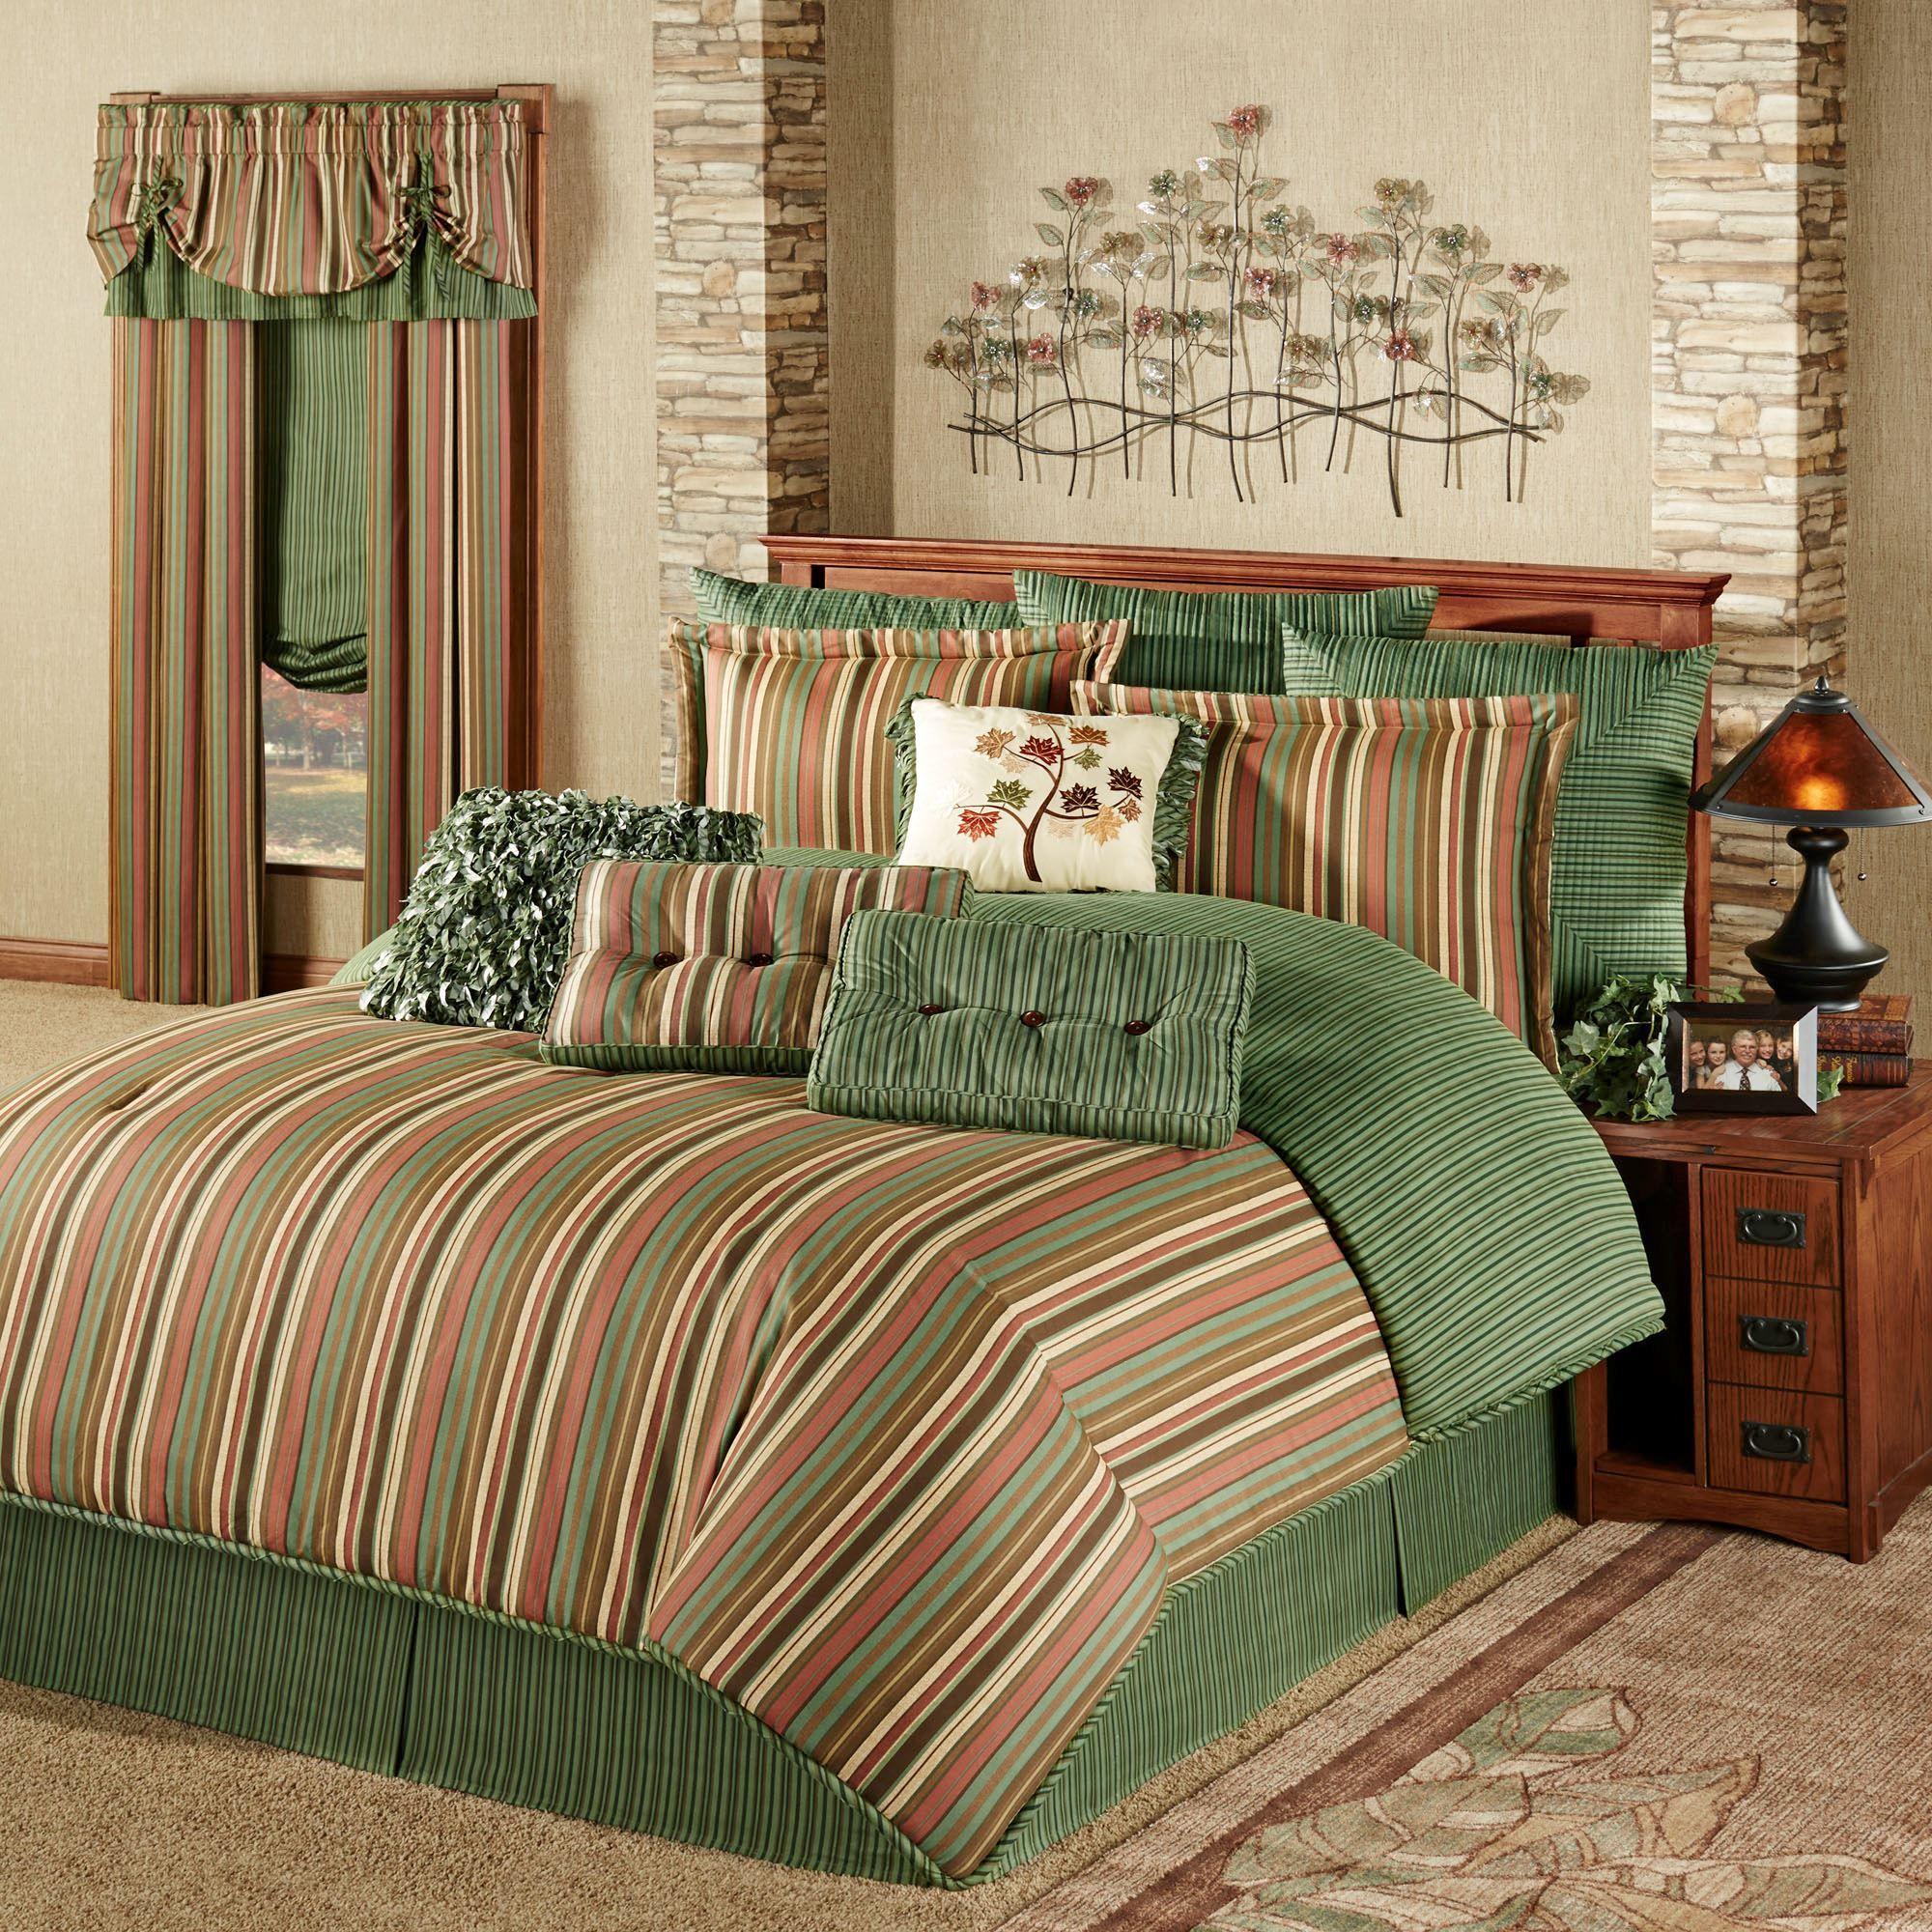 Riverpark Reversible Striped Comforter Bedding